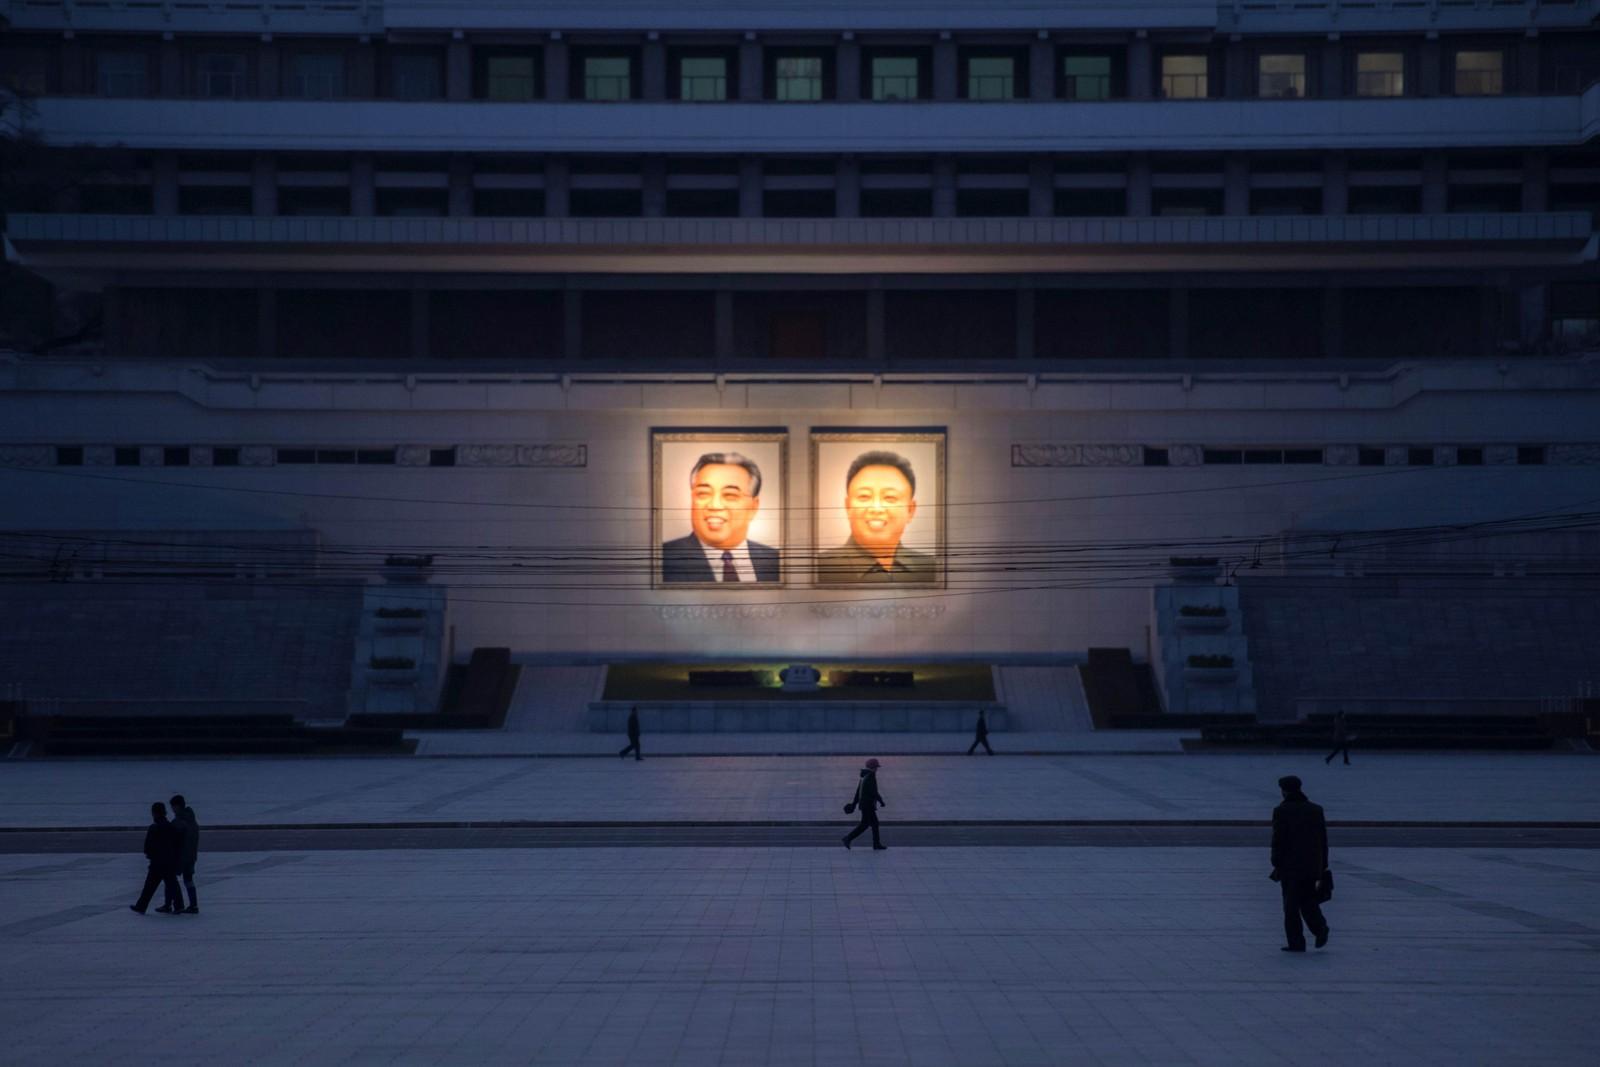 Fotgjengere går forbi portretter av Kim Il-sung Kim Jon-il i Pyongyang i Nord-Korea.